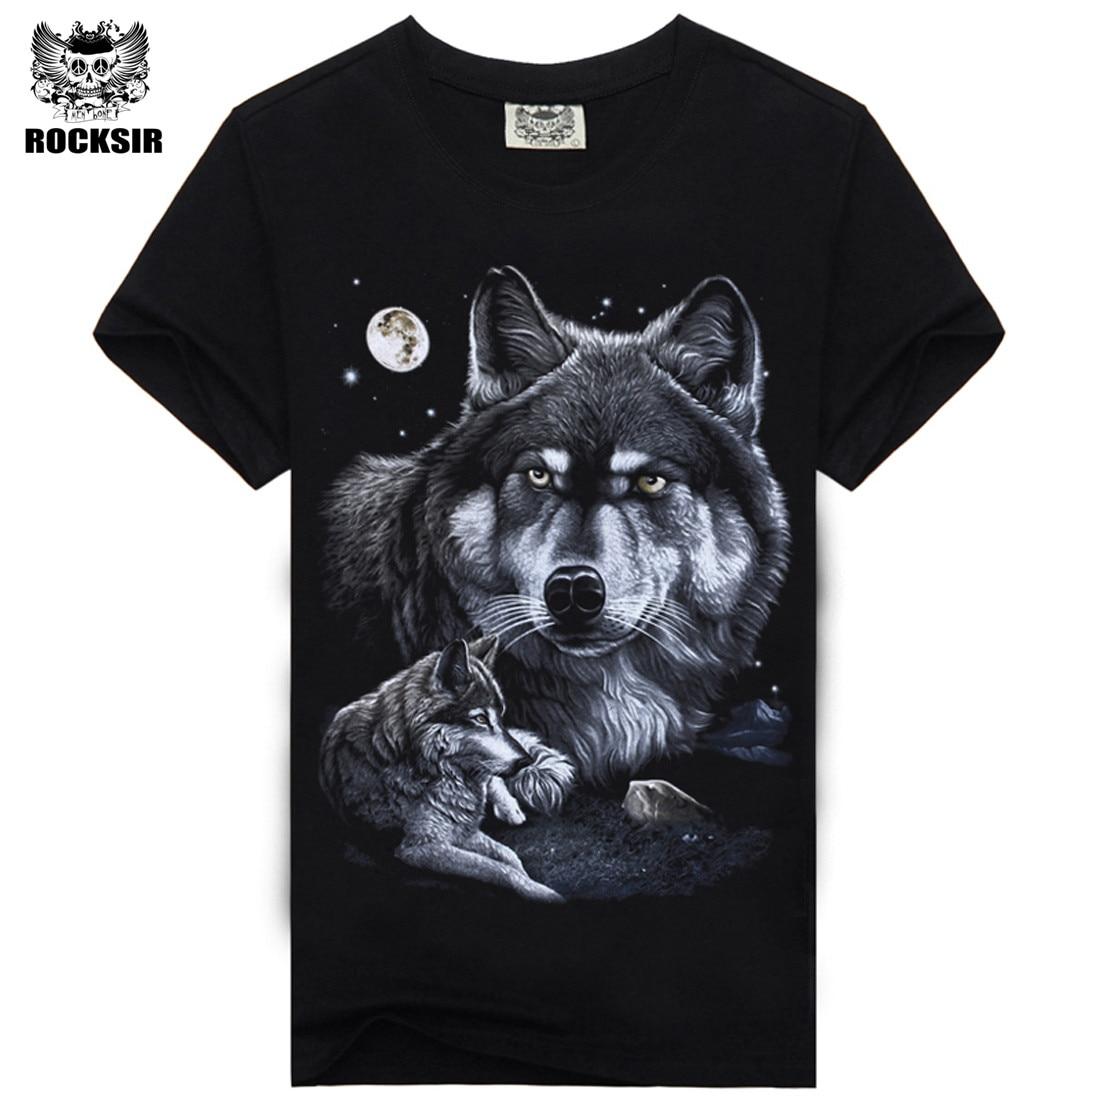 Rocksir 3d wolf t shirt mens Brand 3D Indians wolf Print t shirts Cotton wolves Men t-shirt Casual Man Tees Mens Tops 11